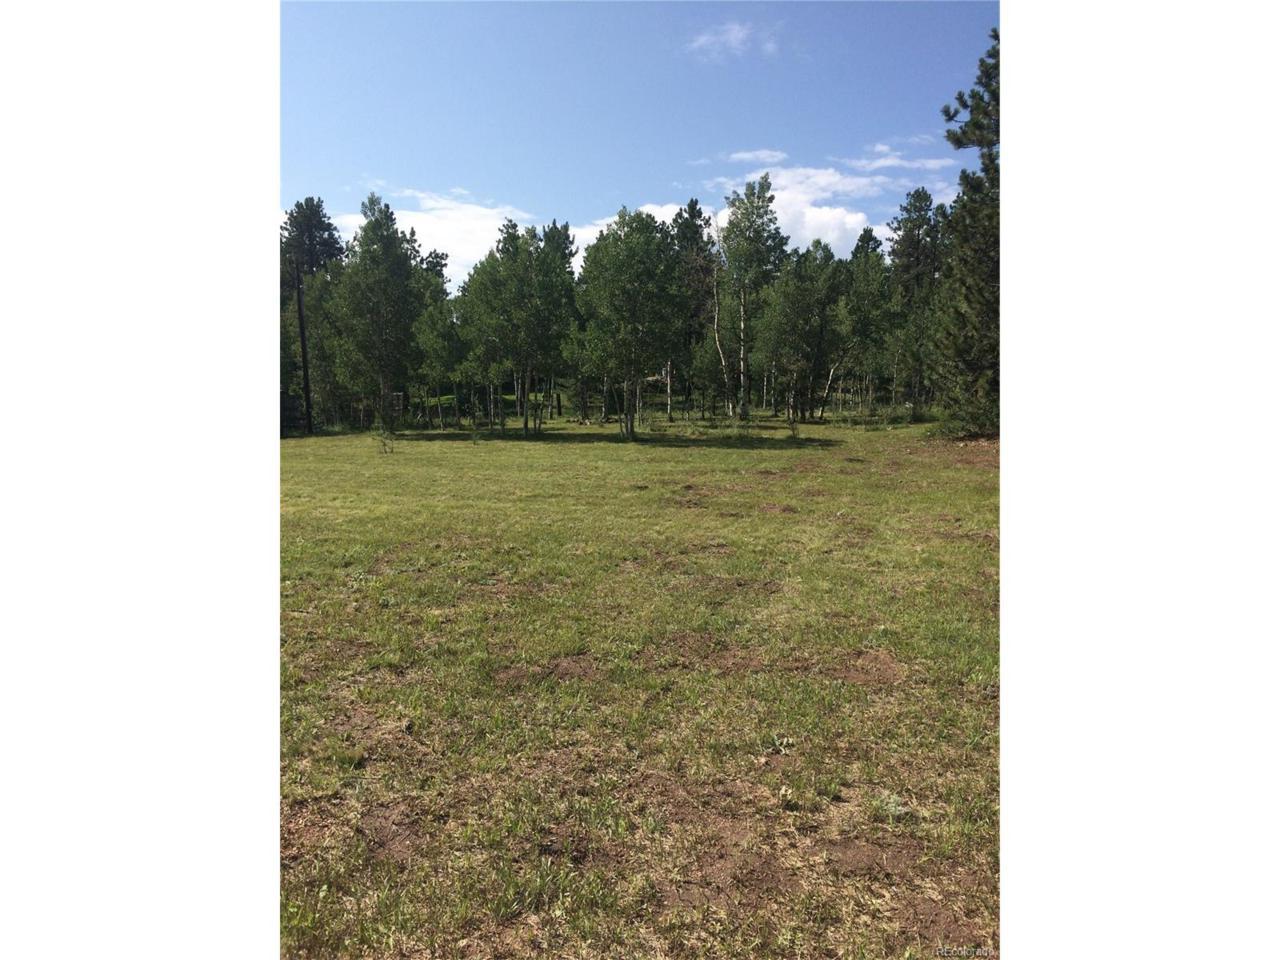 Mount Evans Boulevard, Pine, CO 80470 (MLS #9523621) :: 8z Real Estate